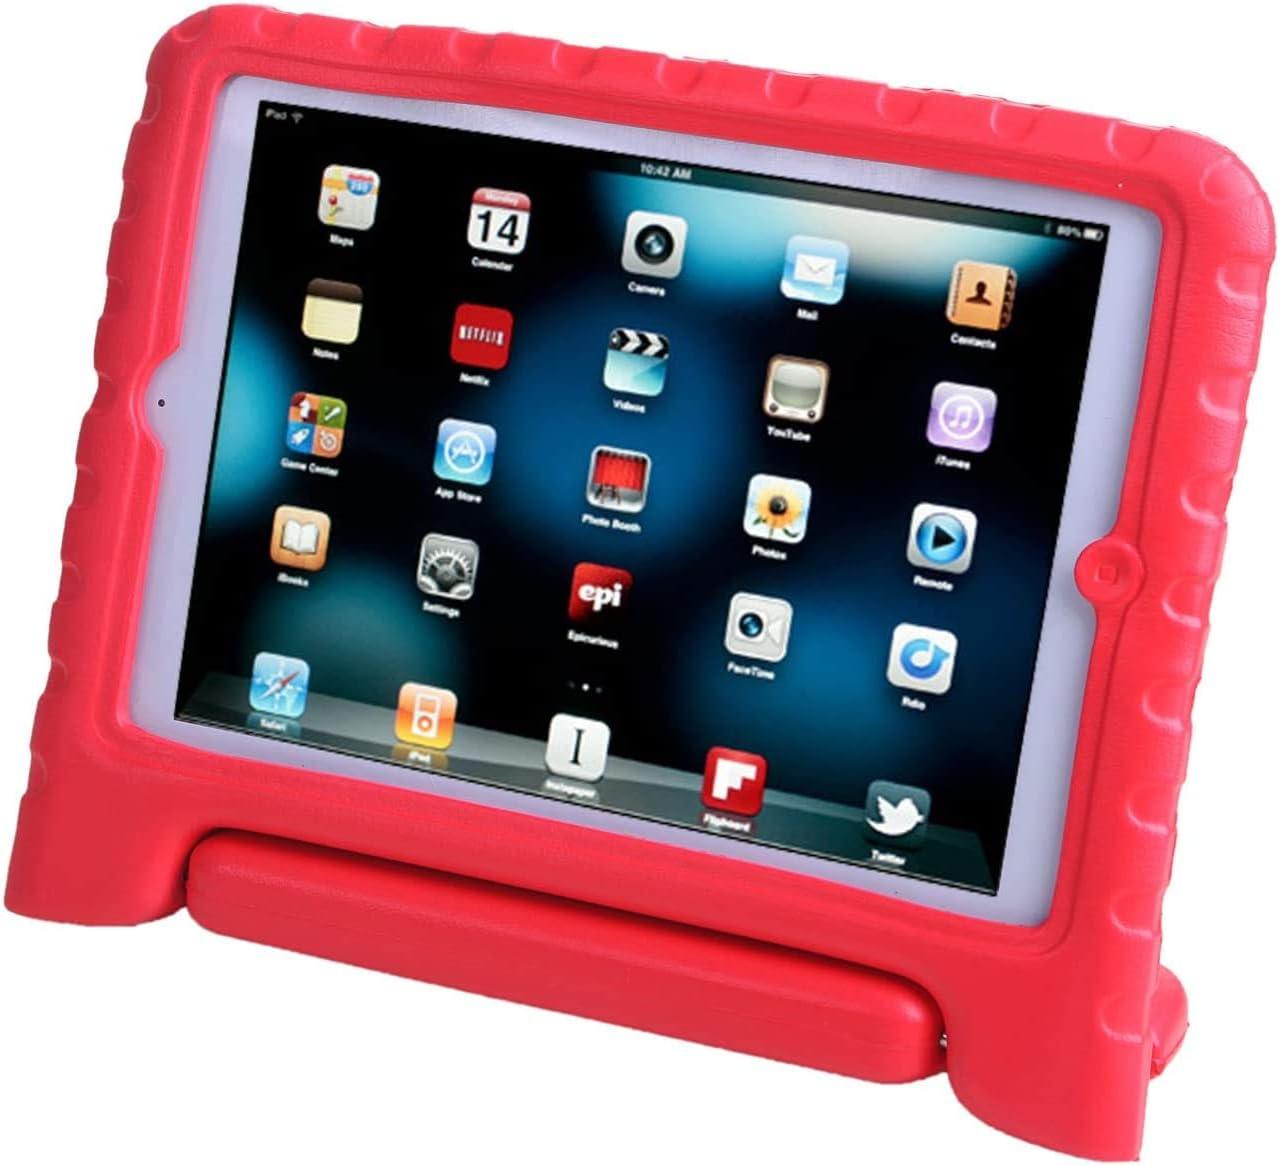 AGRIGLE iPad Mini Case, [Kids Series] Shock Proof Convertible Handle Light Weight Super Protective Stand Cover Case for Apple iPad Mini/Mini 2/Mini 3 (Red)